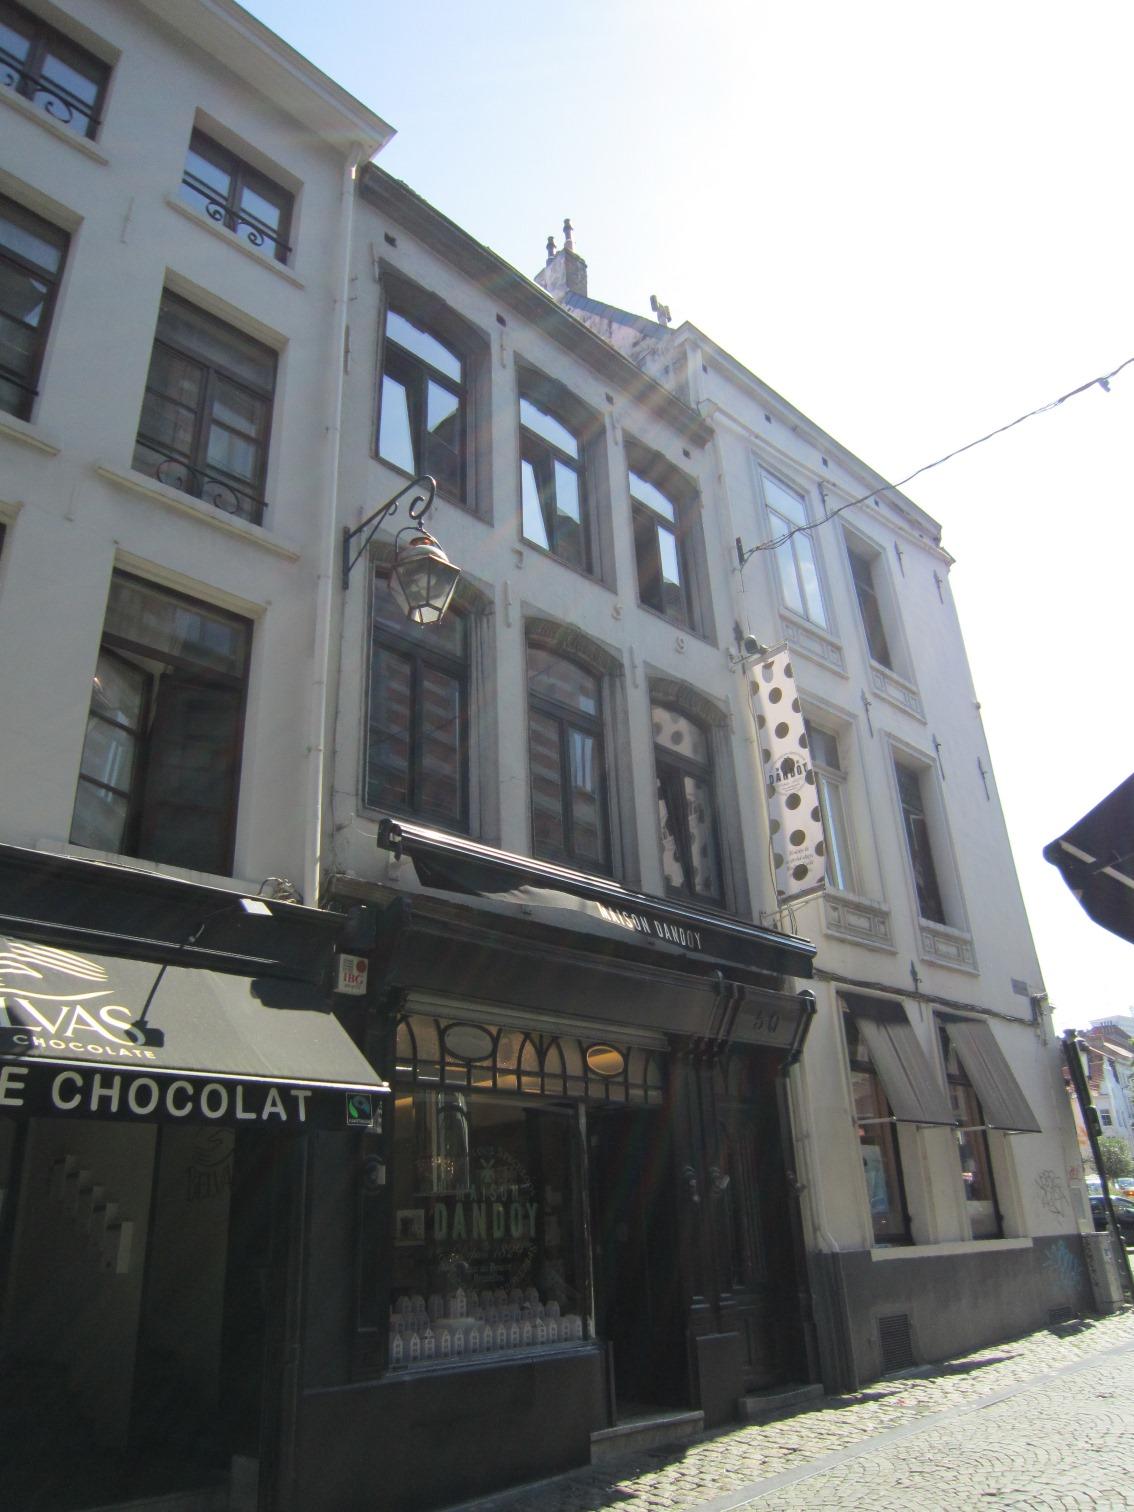 Rollebeekstraat 50, 2015